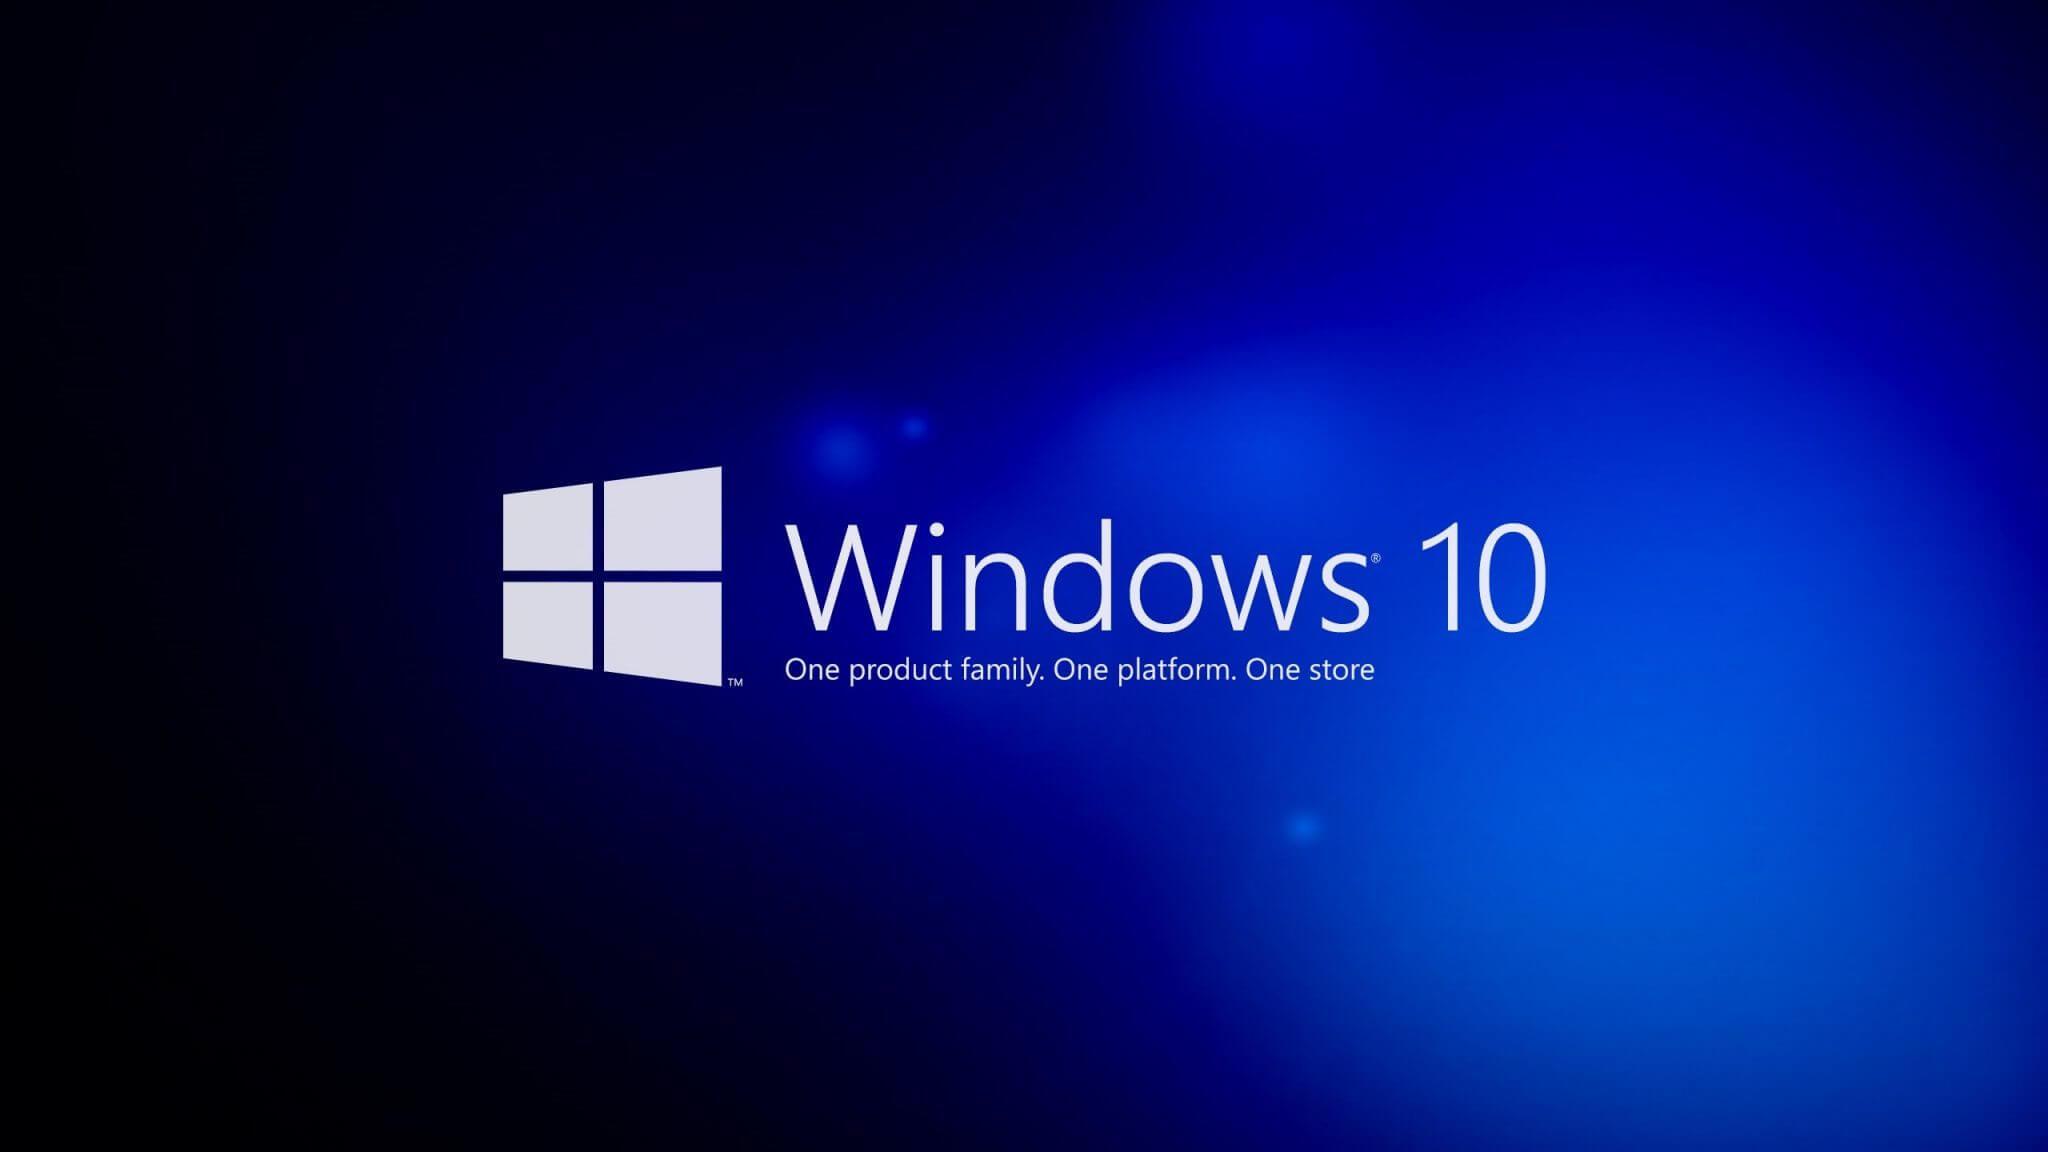 Windows 10 Technology HD Wide Wallpaper - Microsoft libera Windows 10 Insider Preview Build 14986 para PC. Confira as novidades